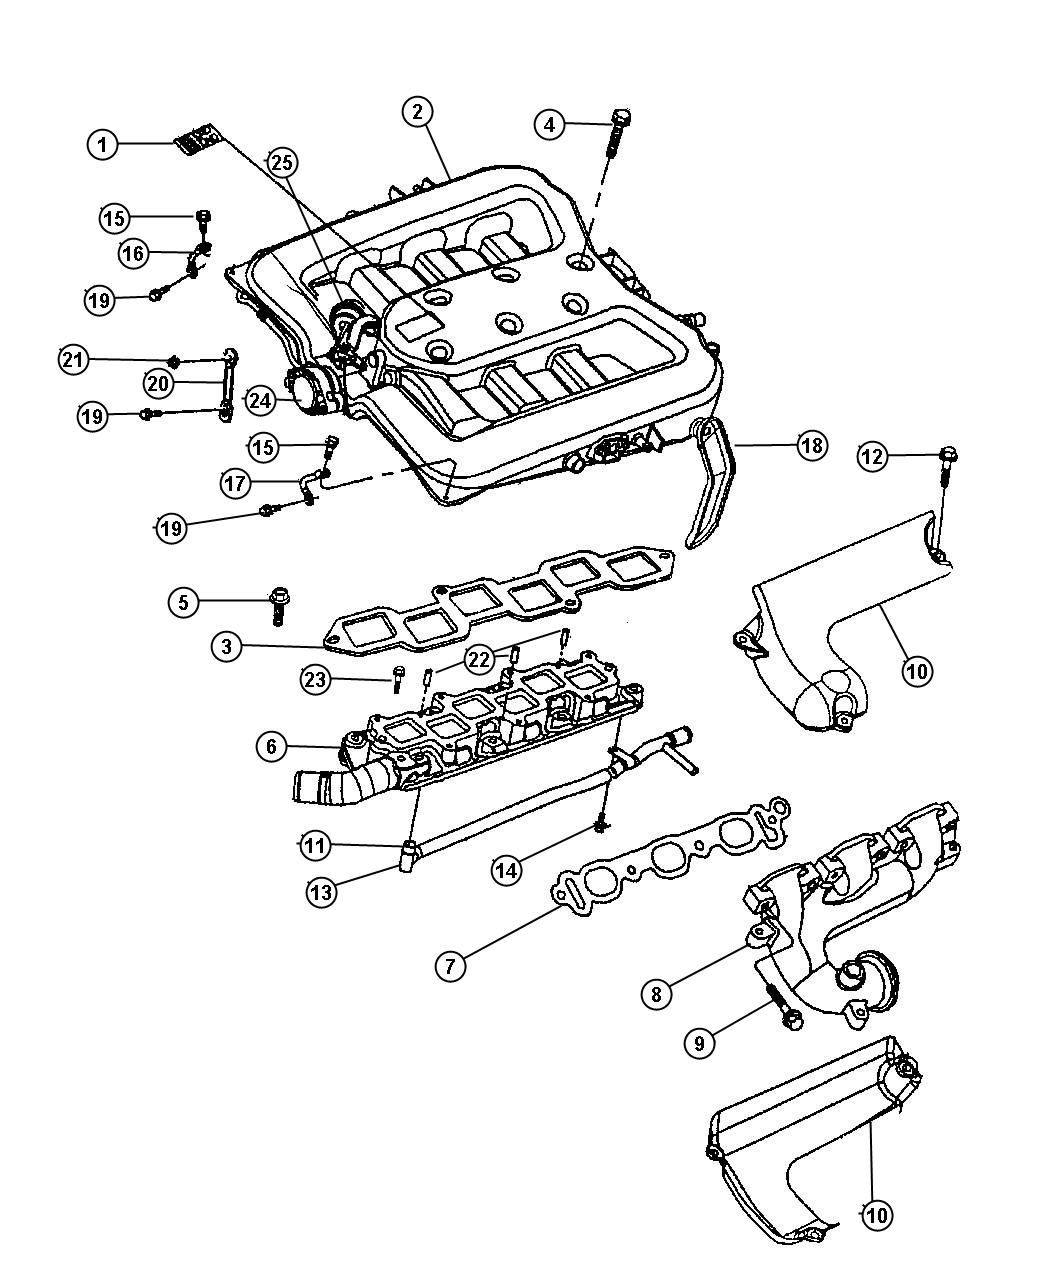 Dodge Ram Exterior Parts Diagram Html